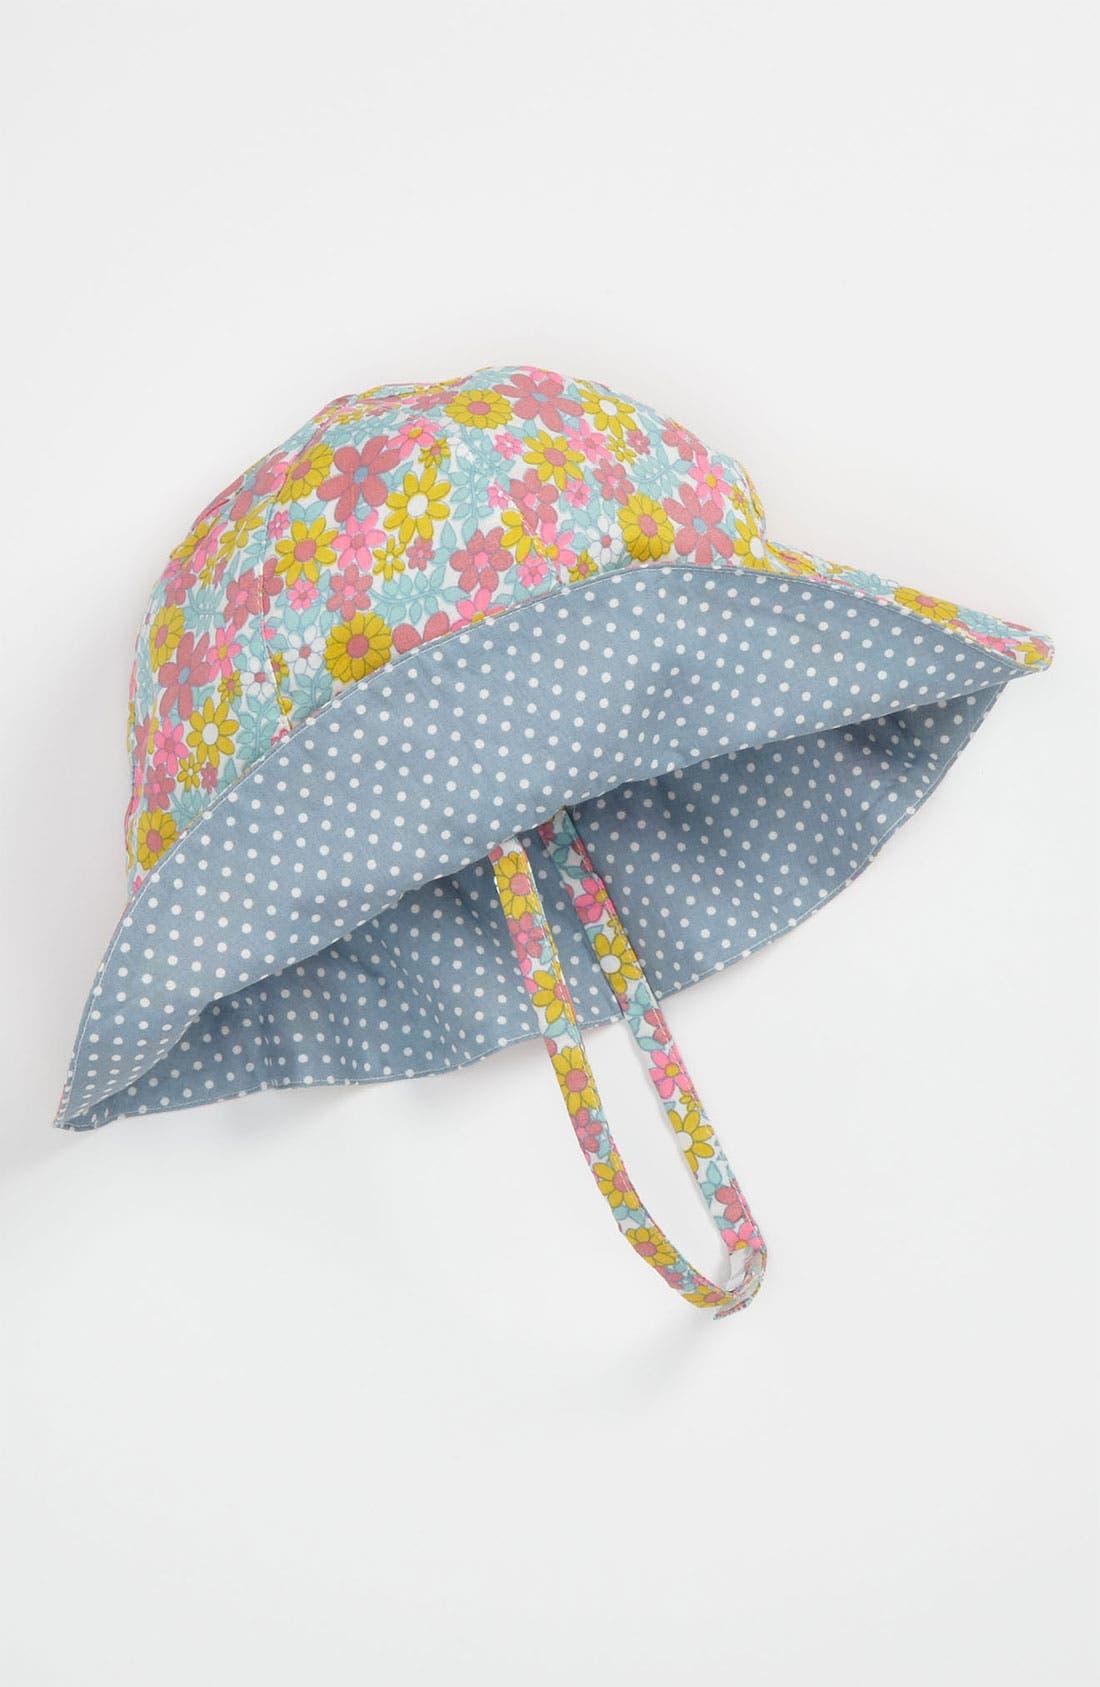 Alternate Image 1 Selected - Nordstrom Baby Reversible Sun Hat (Infant)